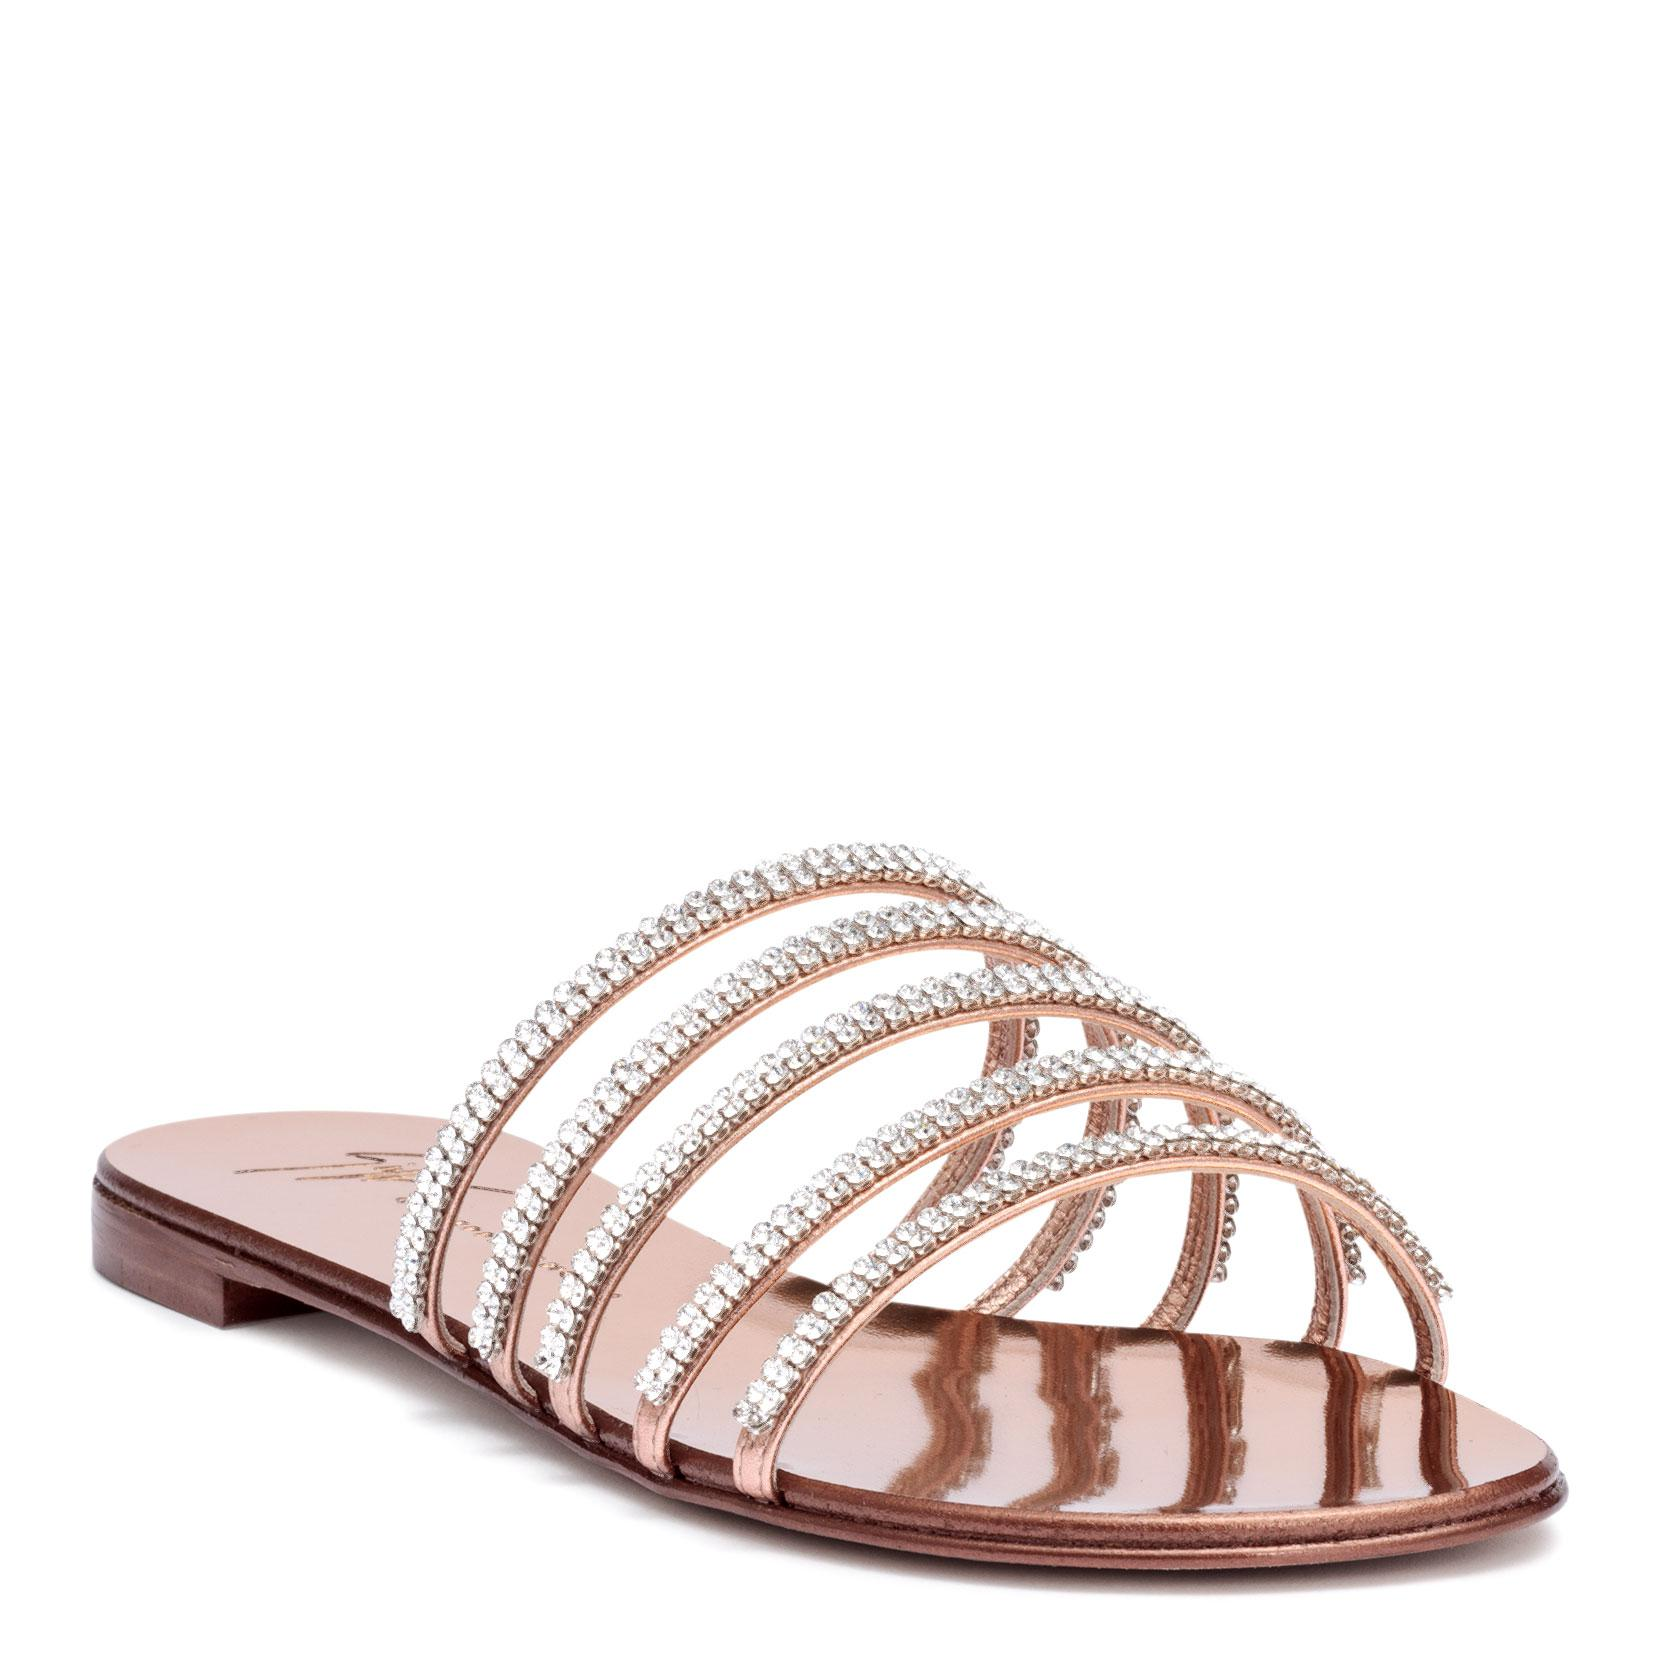 Giuseppe Zanotti Patent flat sandal with crystals MICHELA OOLBHt9ZT